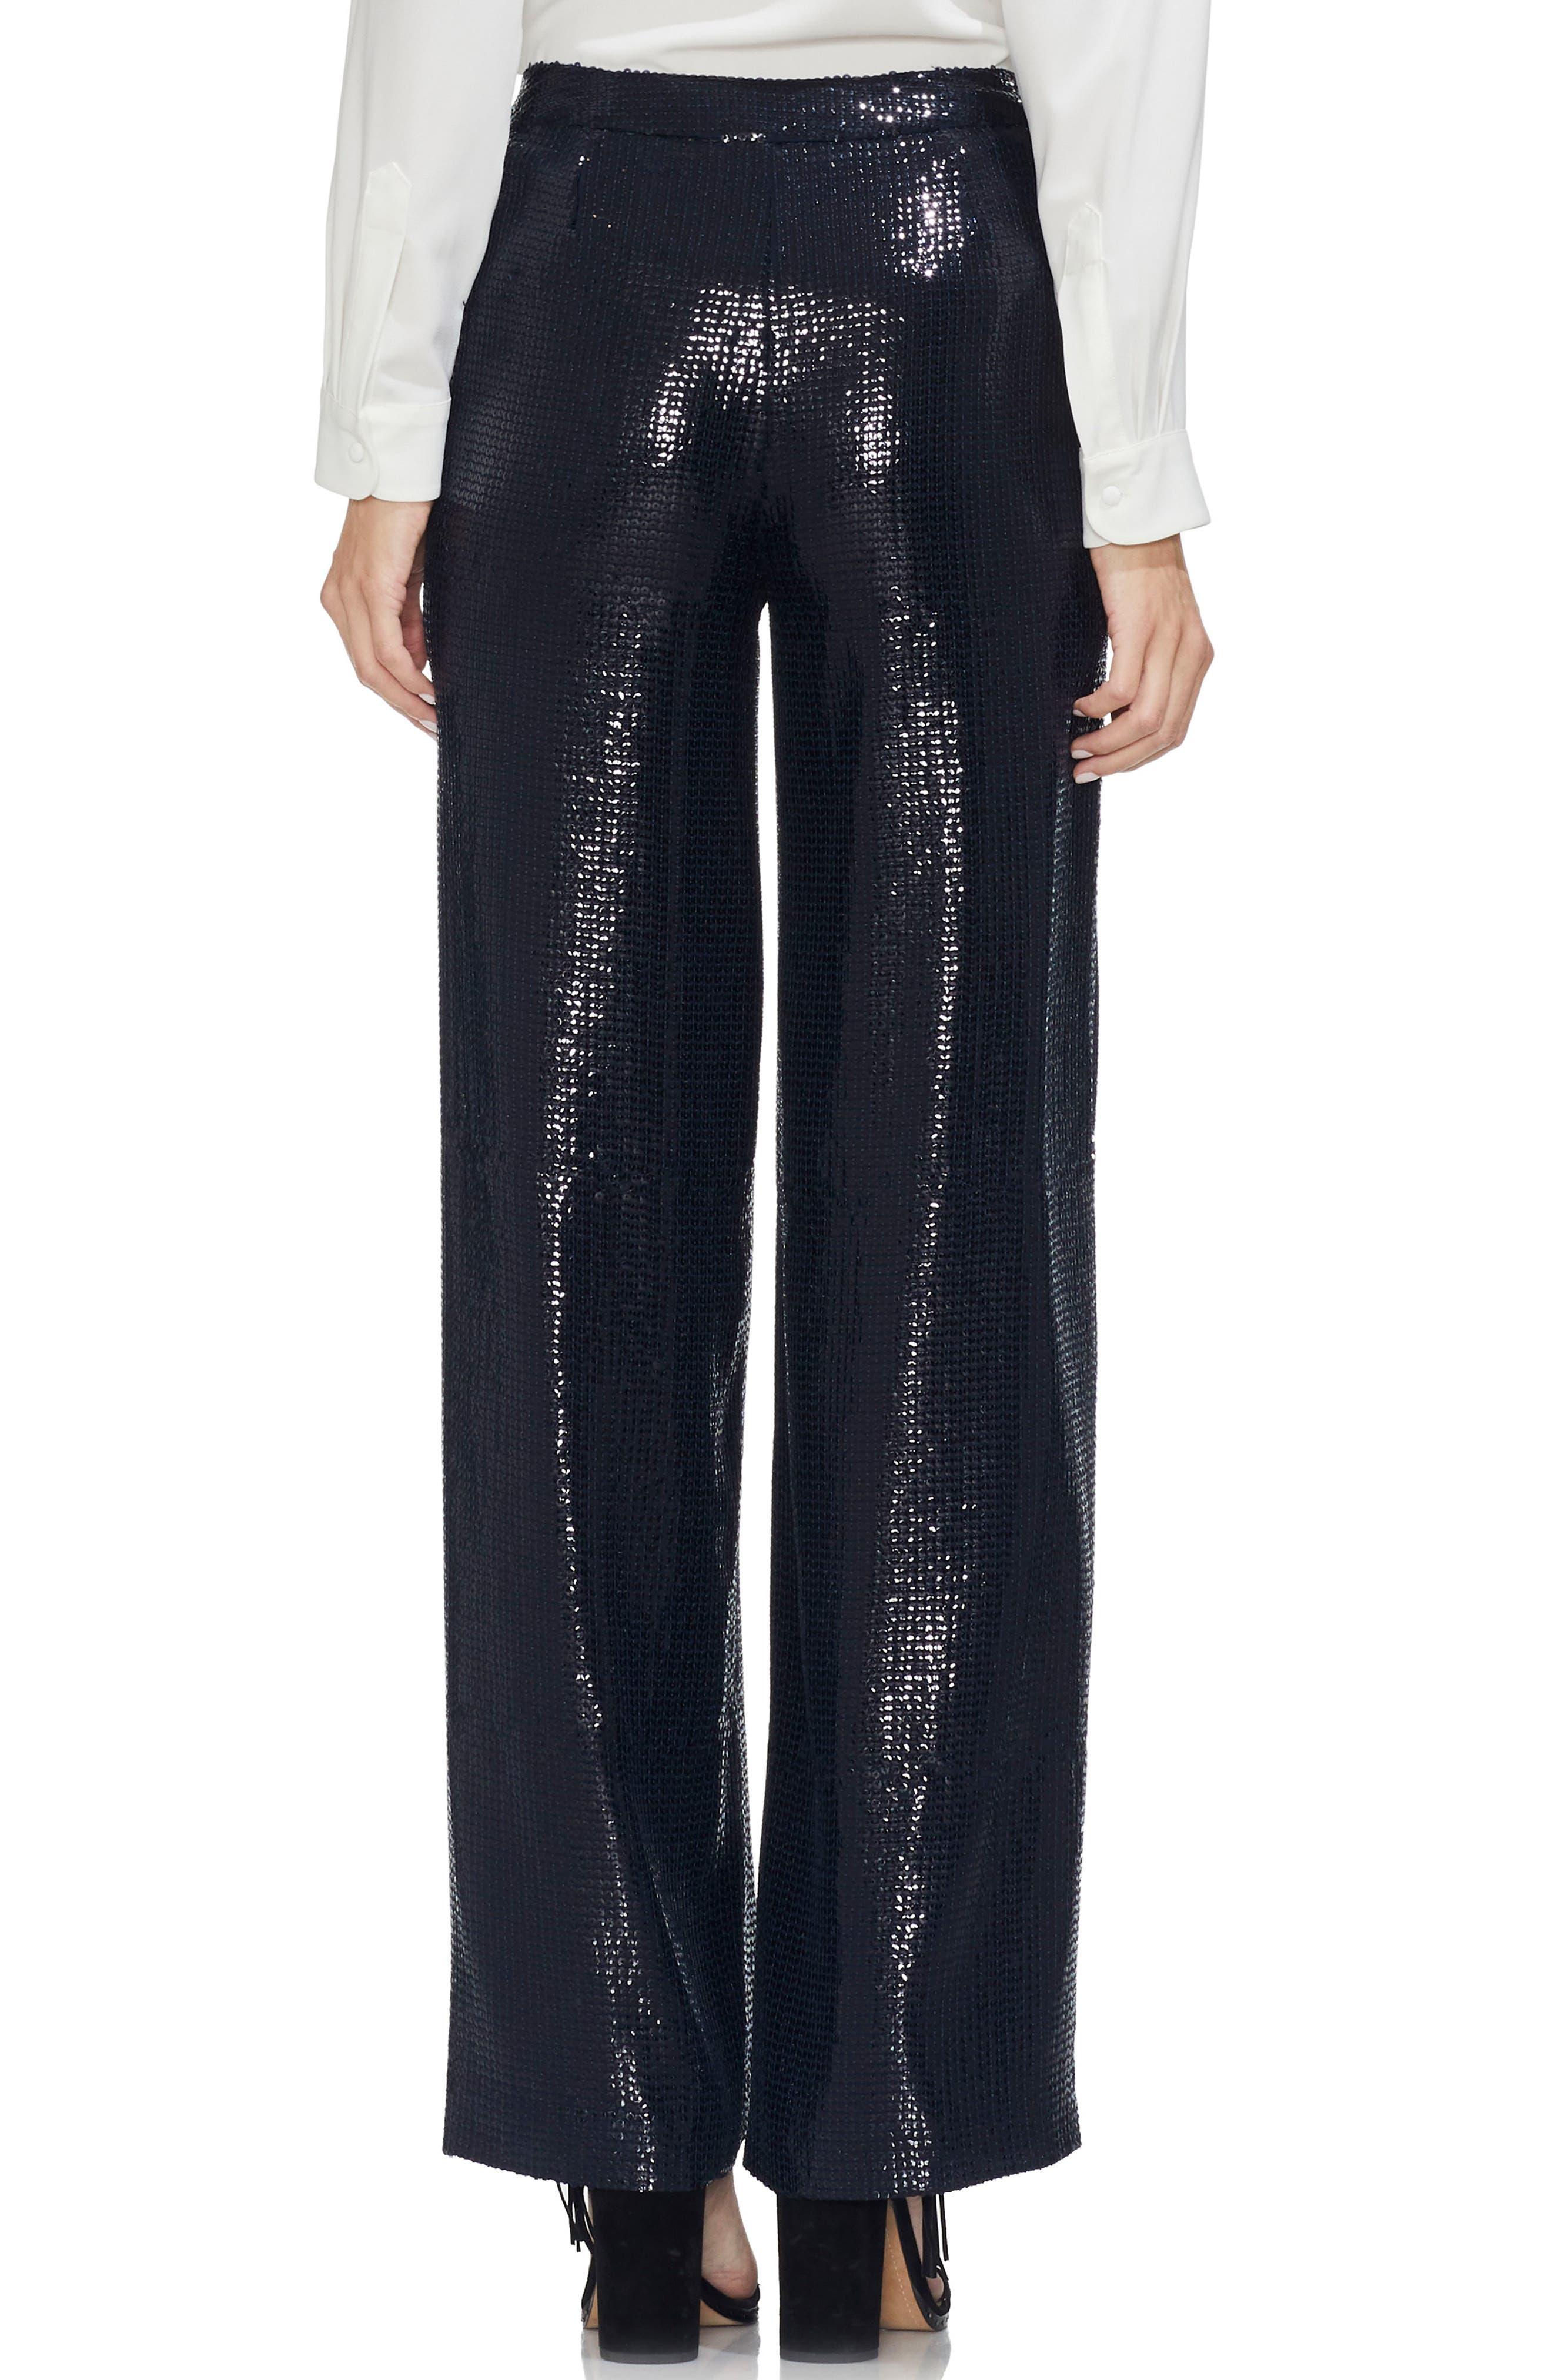 Allover Sequin Wide Leg Pants,                             Alternate thumbnail 2, color,                             CLASSIC NAVY